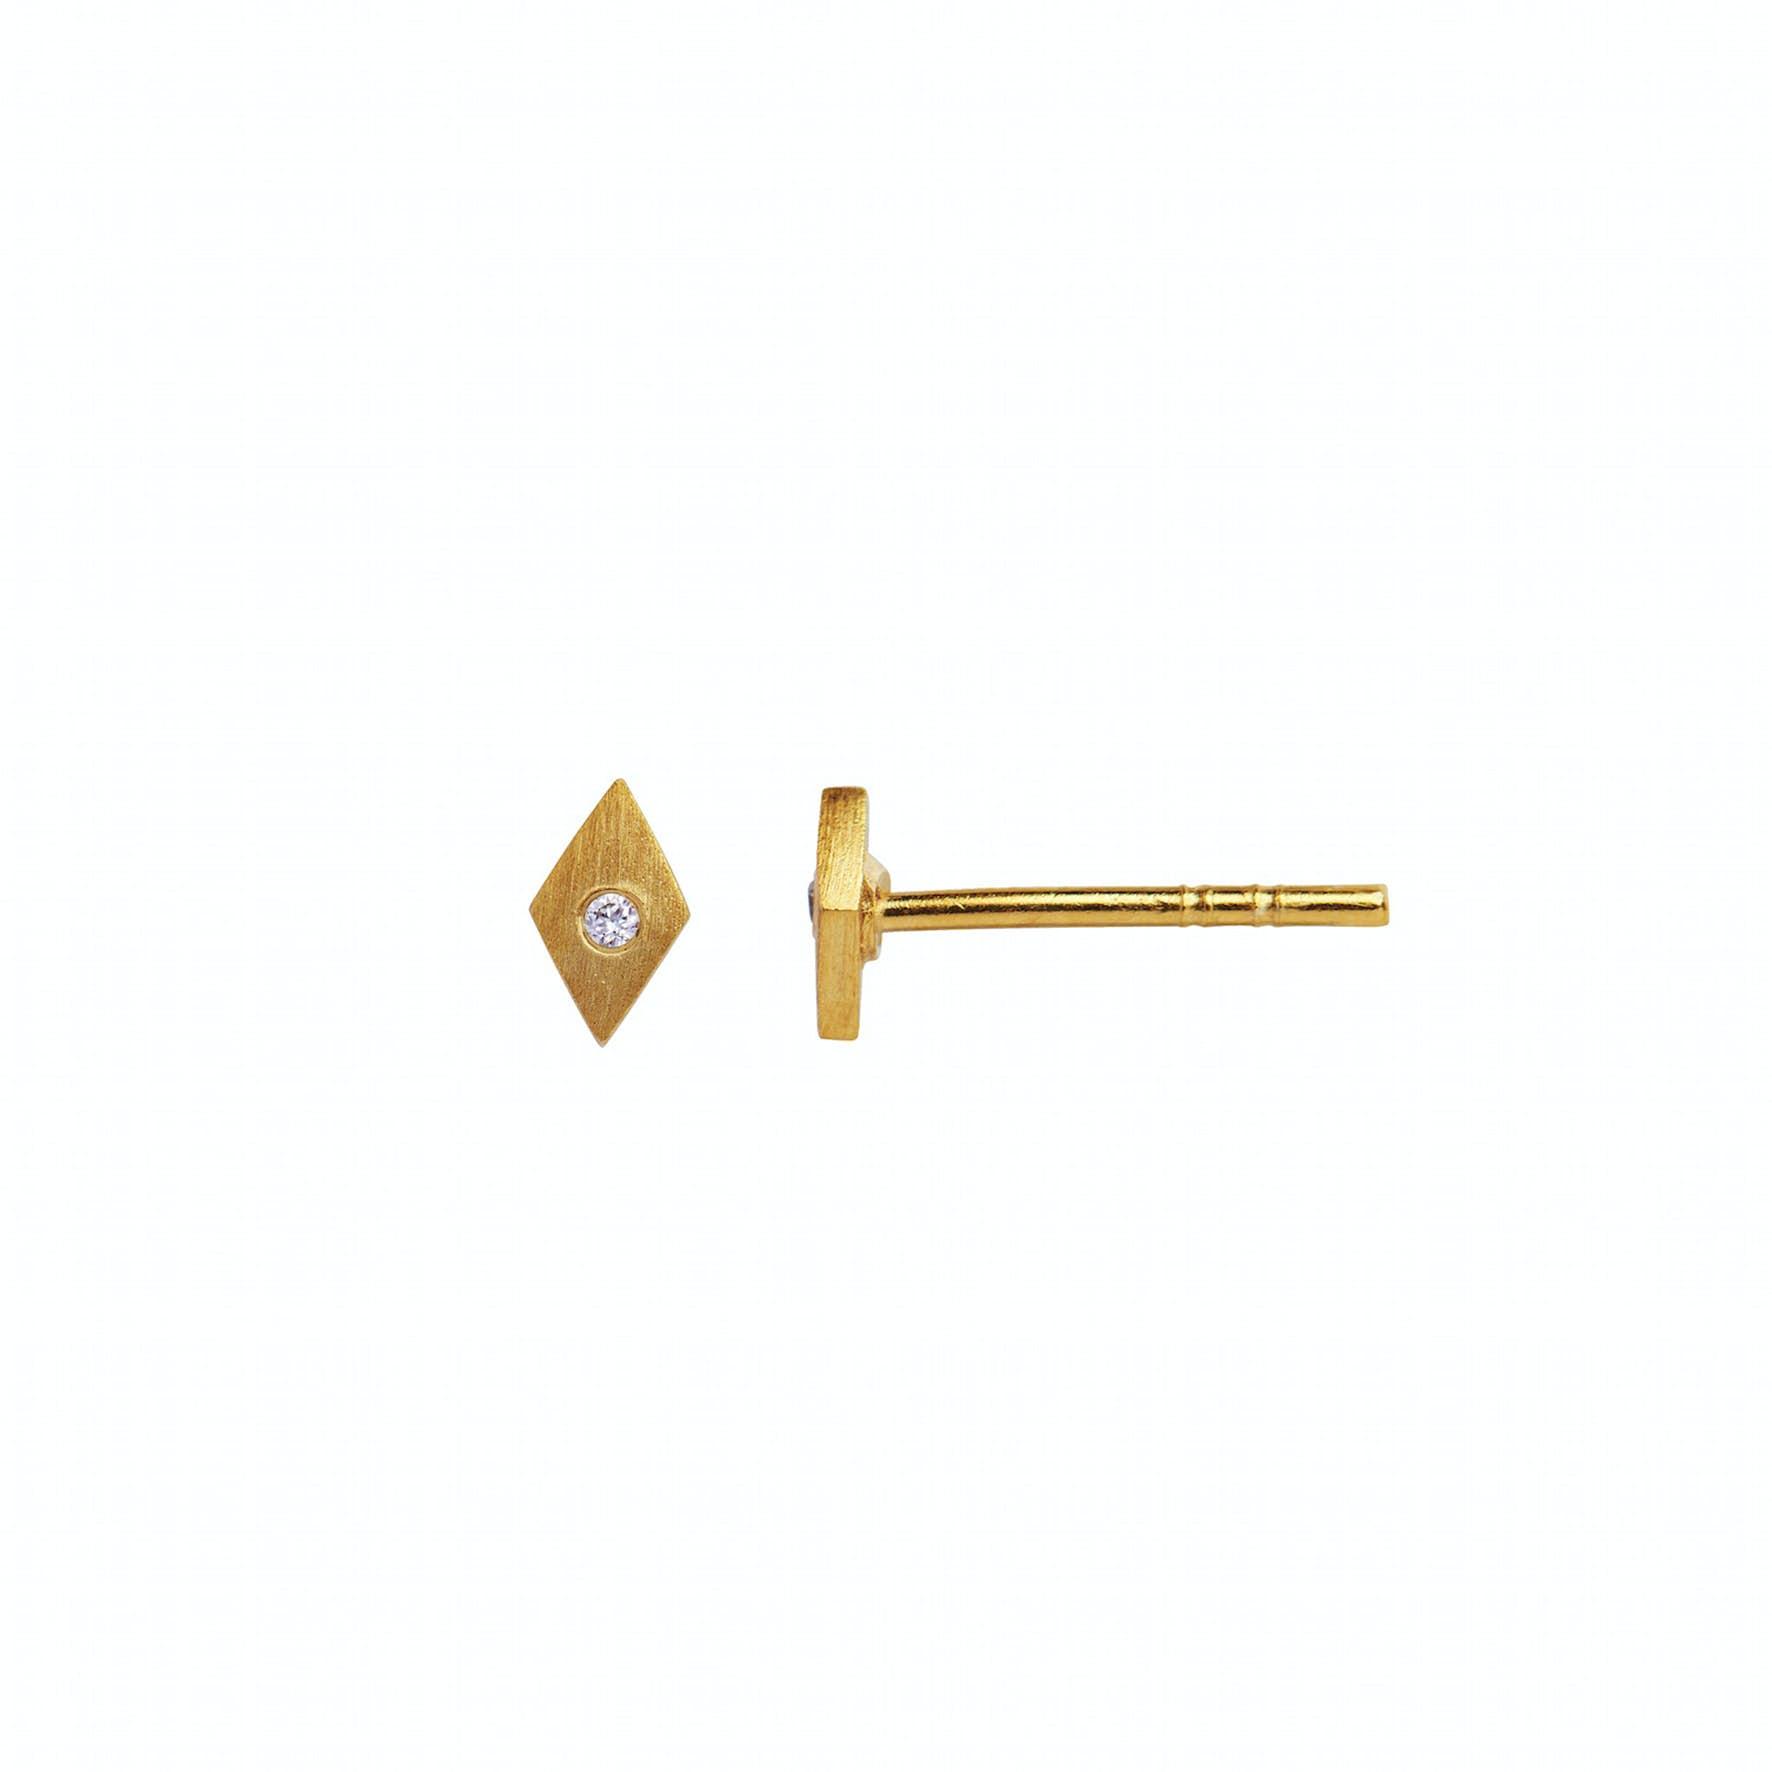 Petit Harlekin Earstick Piece fra STINE A Jewelry i Forgyldt-Sølv Sterling 925